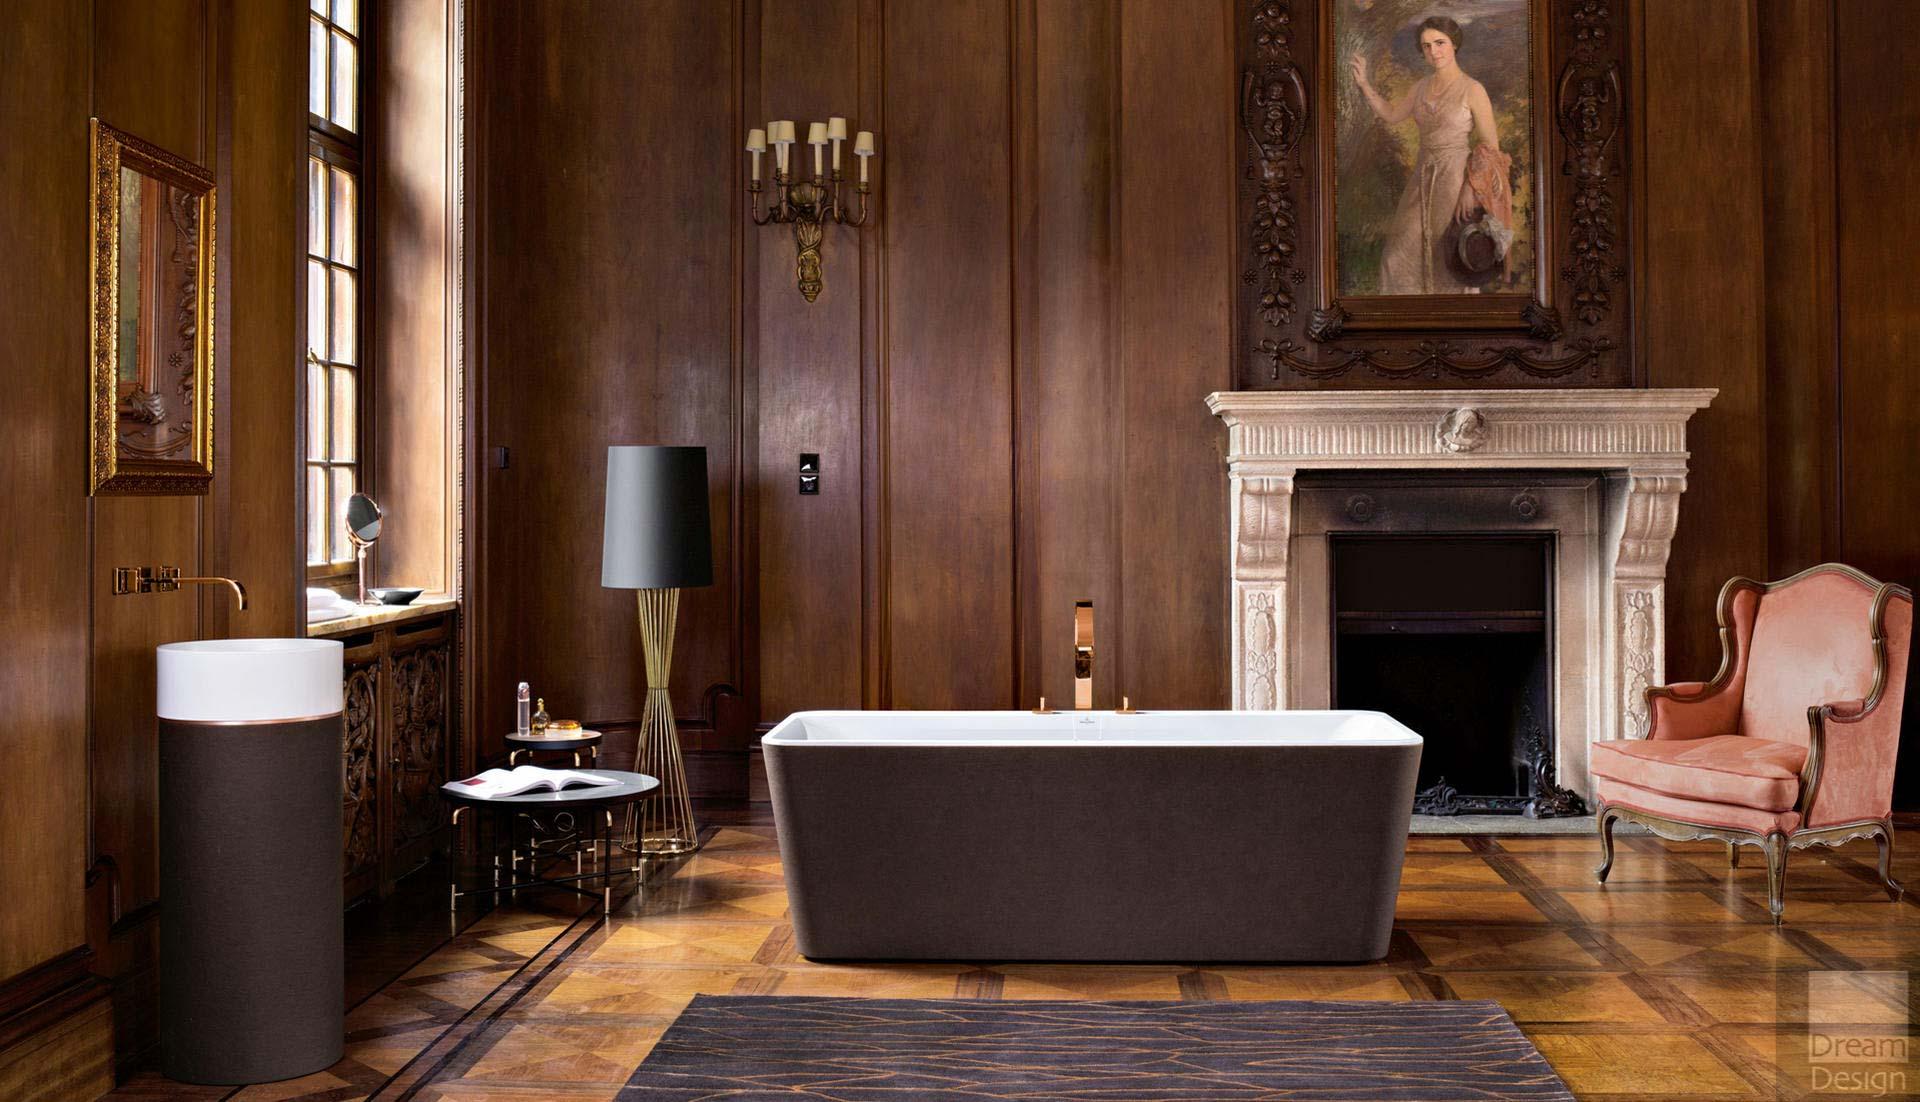 villeroy boch squaro bath dream design interiors ltd - Bathroom Designs Villeroy And Boch